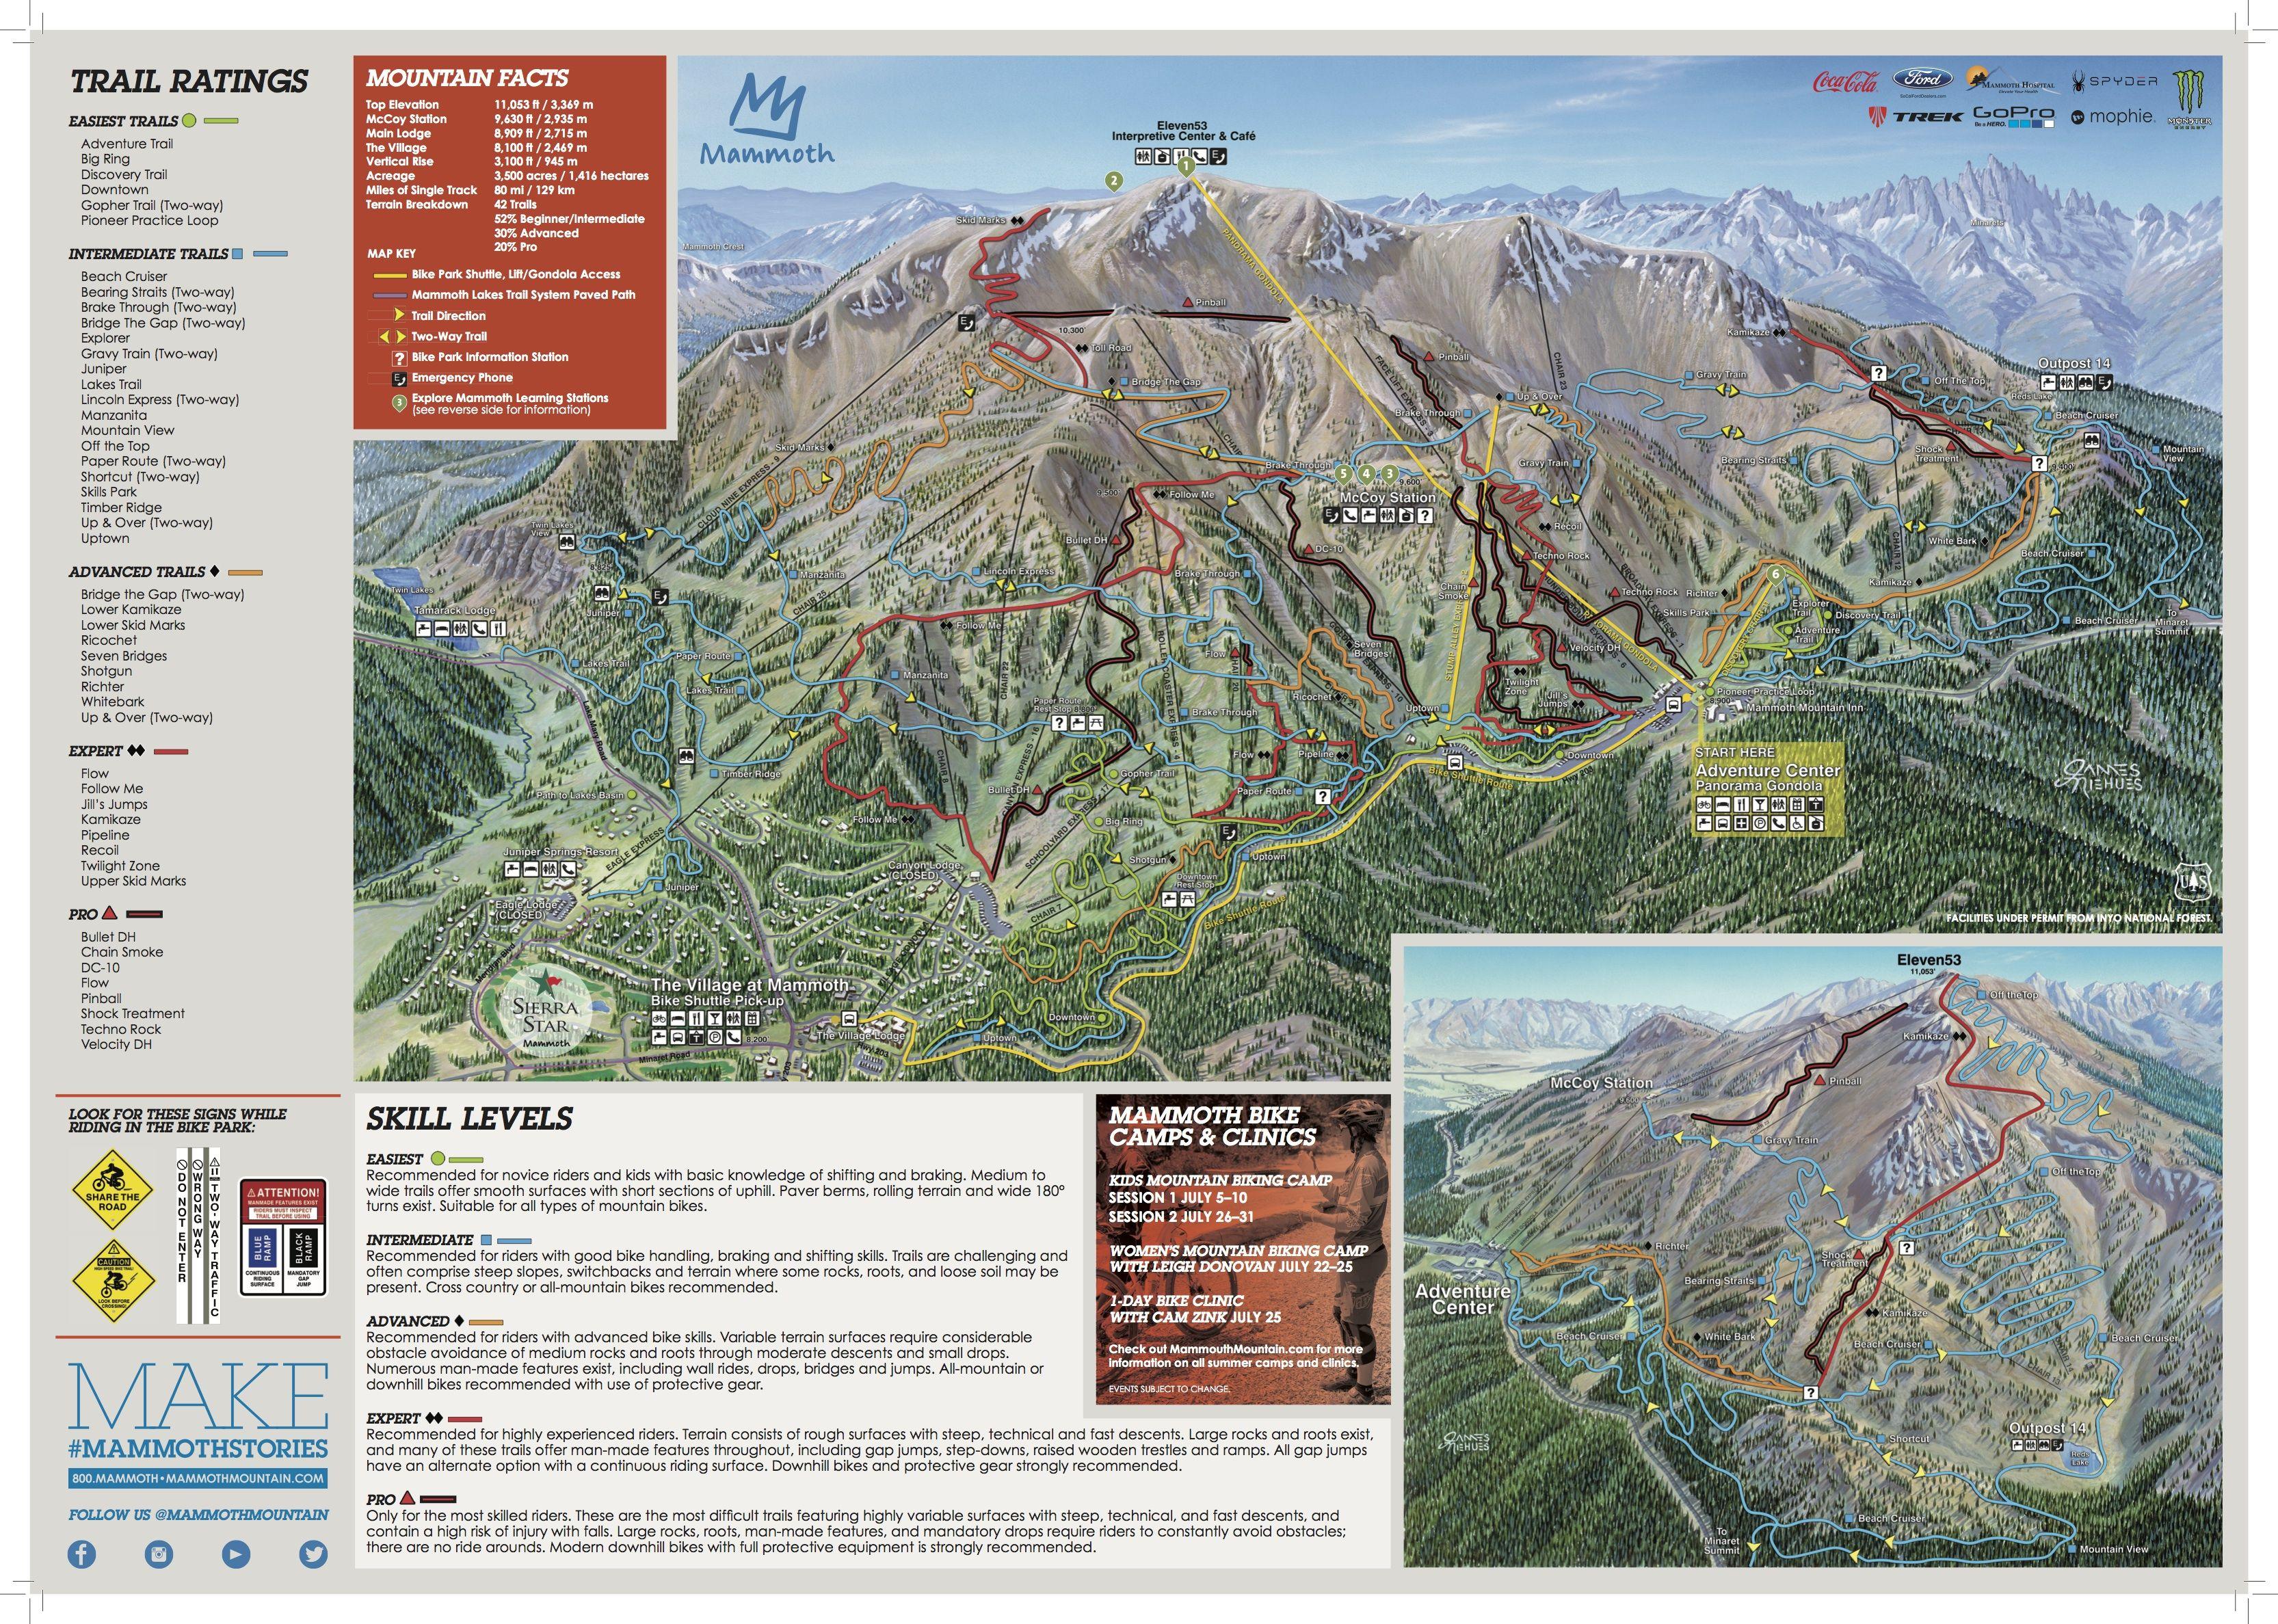 Mammoth Mountain Trail Map Bike Favorites Pinterest Mammoth - Mammoth mountain trail map